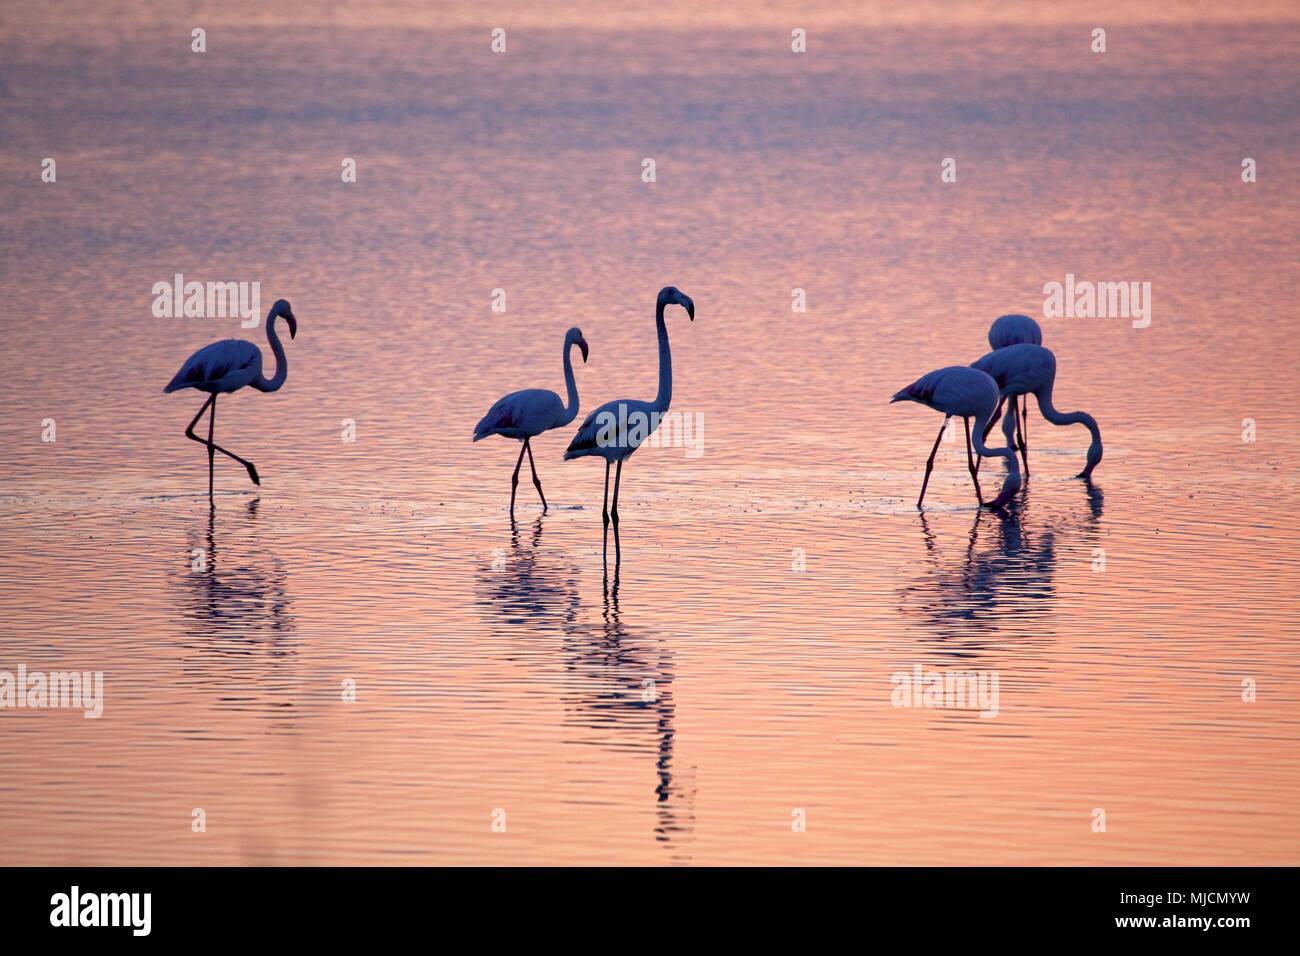 Italy, Sardinia, West coast, Oristano, Sinis peninsula, Porto Mandriola, Capo Mannu, Stagno Sale Porcus, flamingo, morning mood, - Stock Image